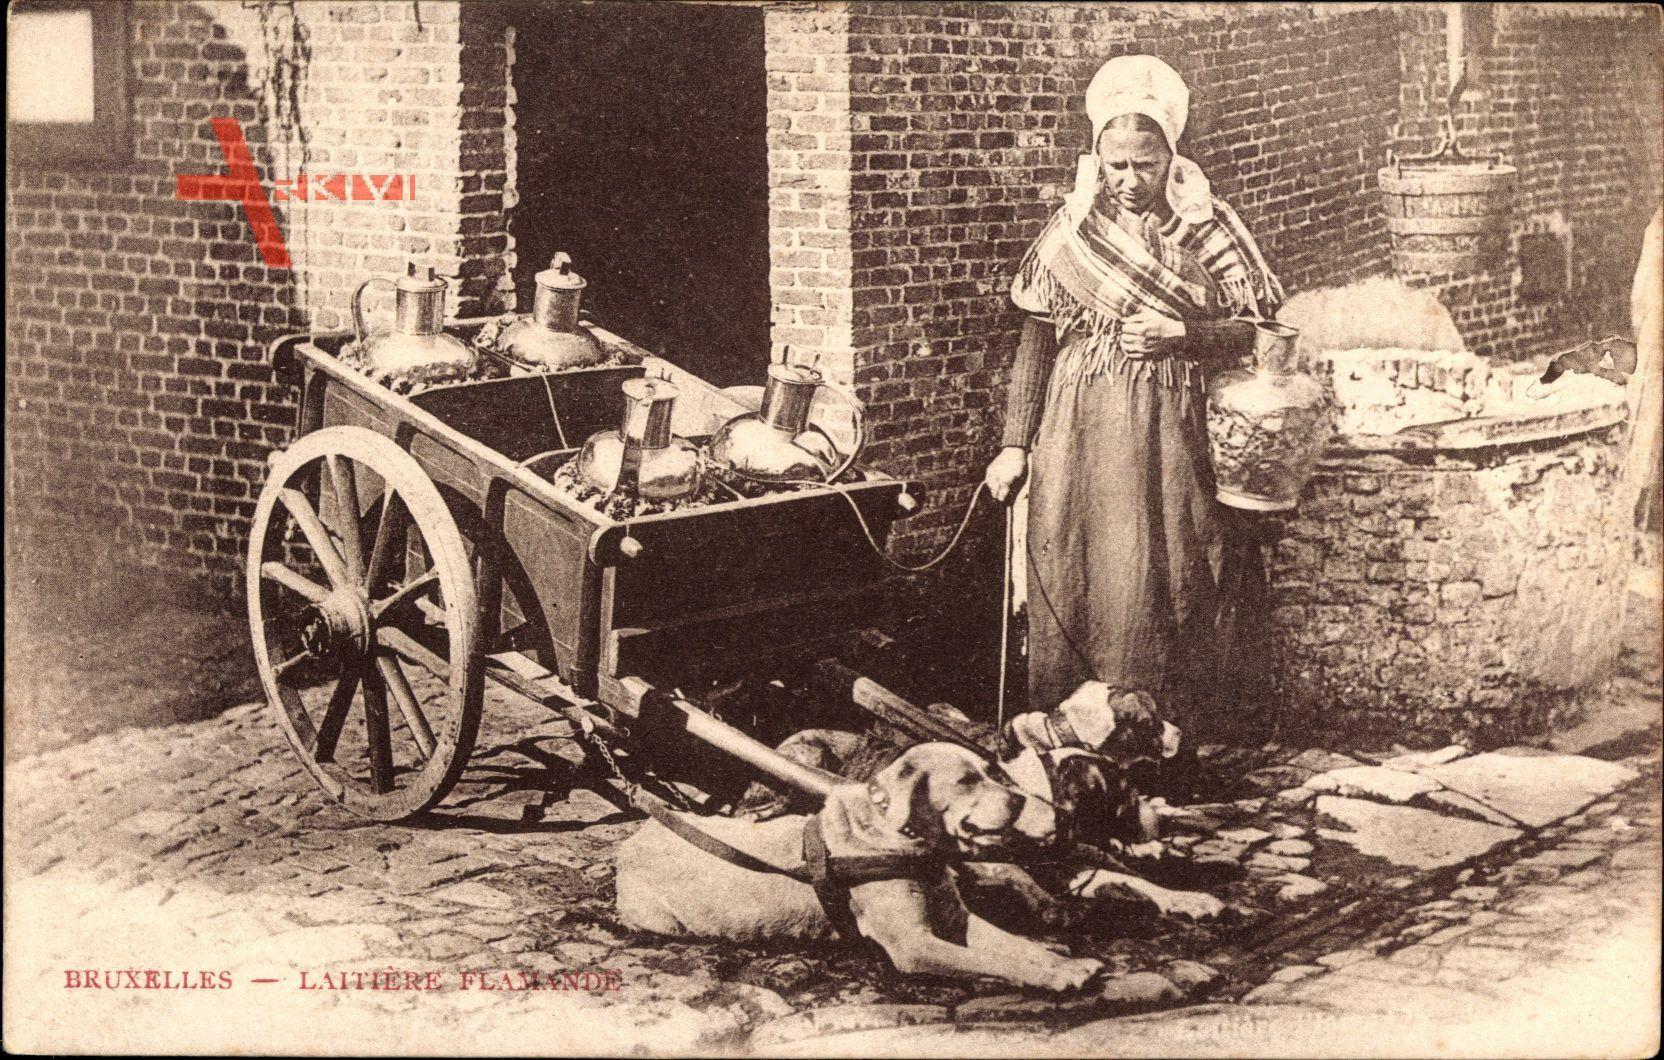 Bruxelles Brüssel, Laitiere Flamande, Milchfrau in belgischer Tracht, Hunde